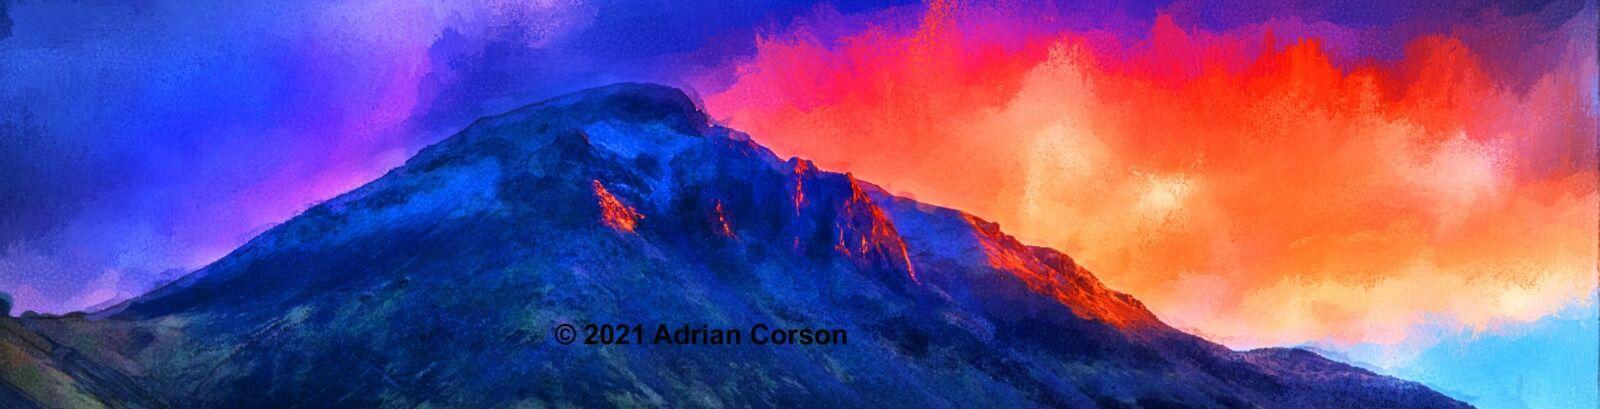 125-mountain peak sunrise